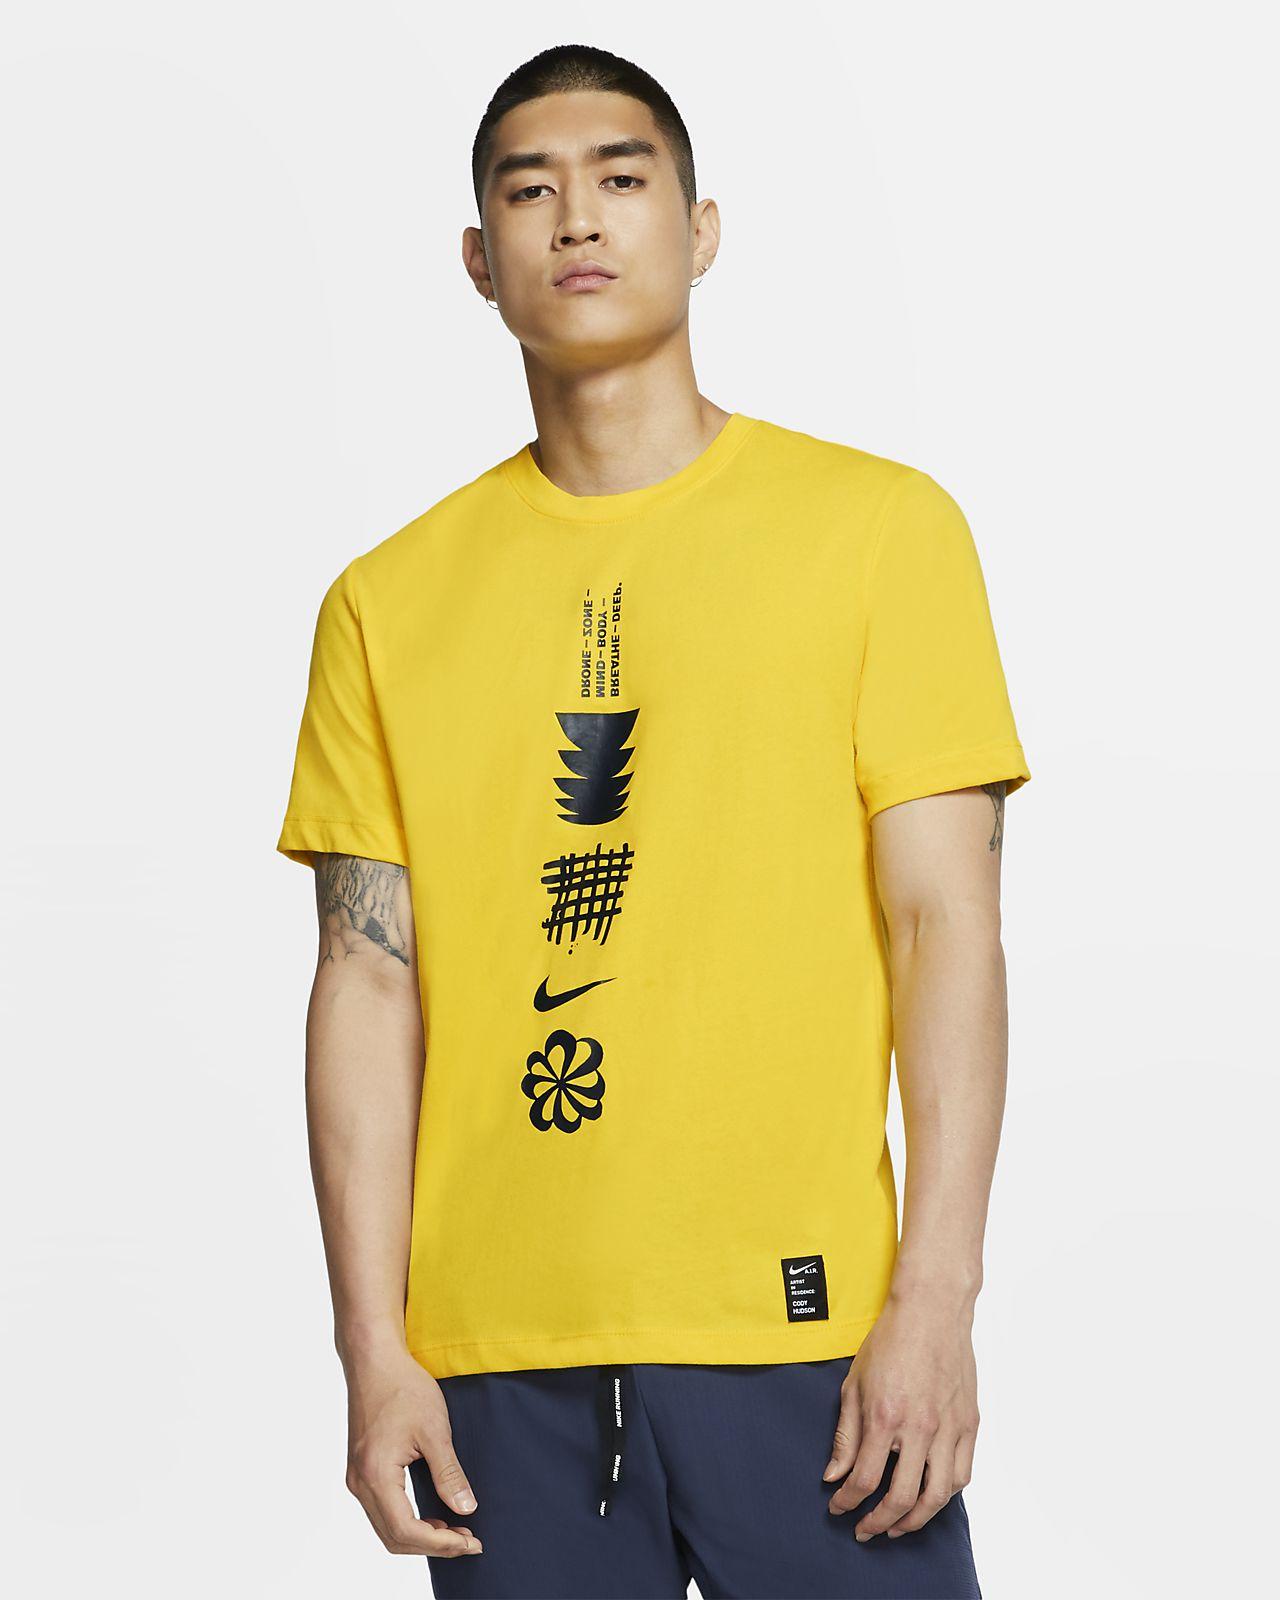 Nike Dri FIT A.I.R. Cody Hudson Men's Running T Shirt